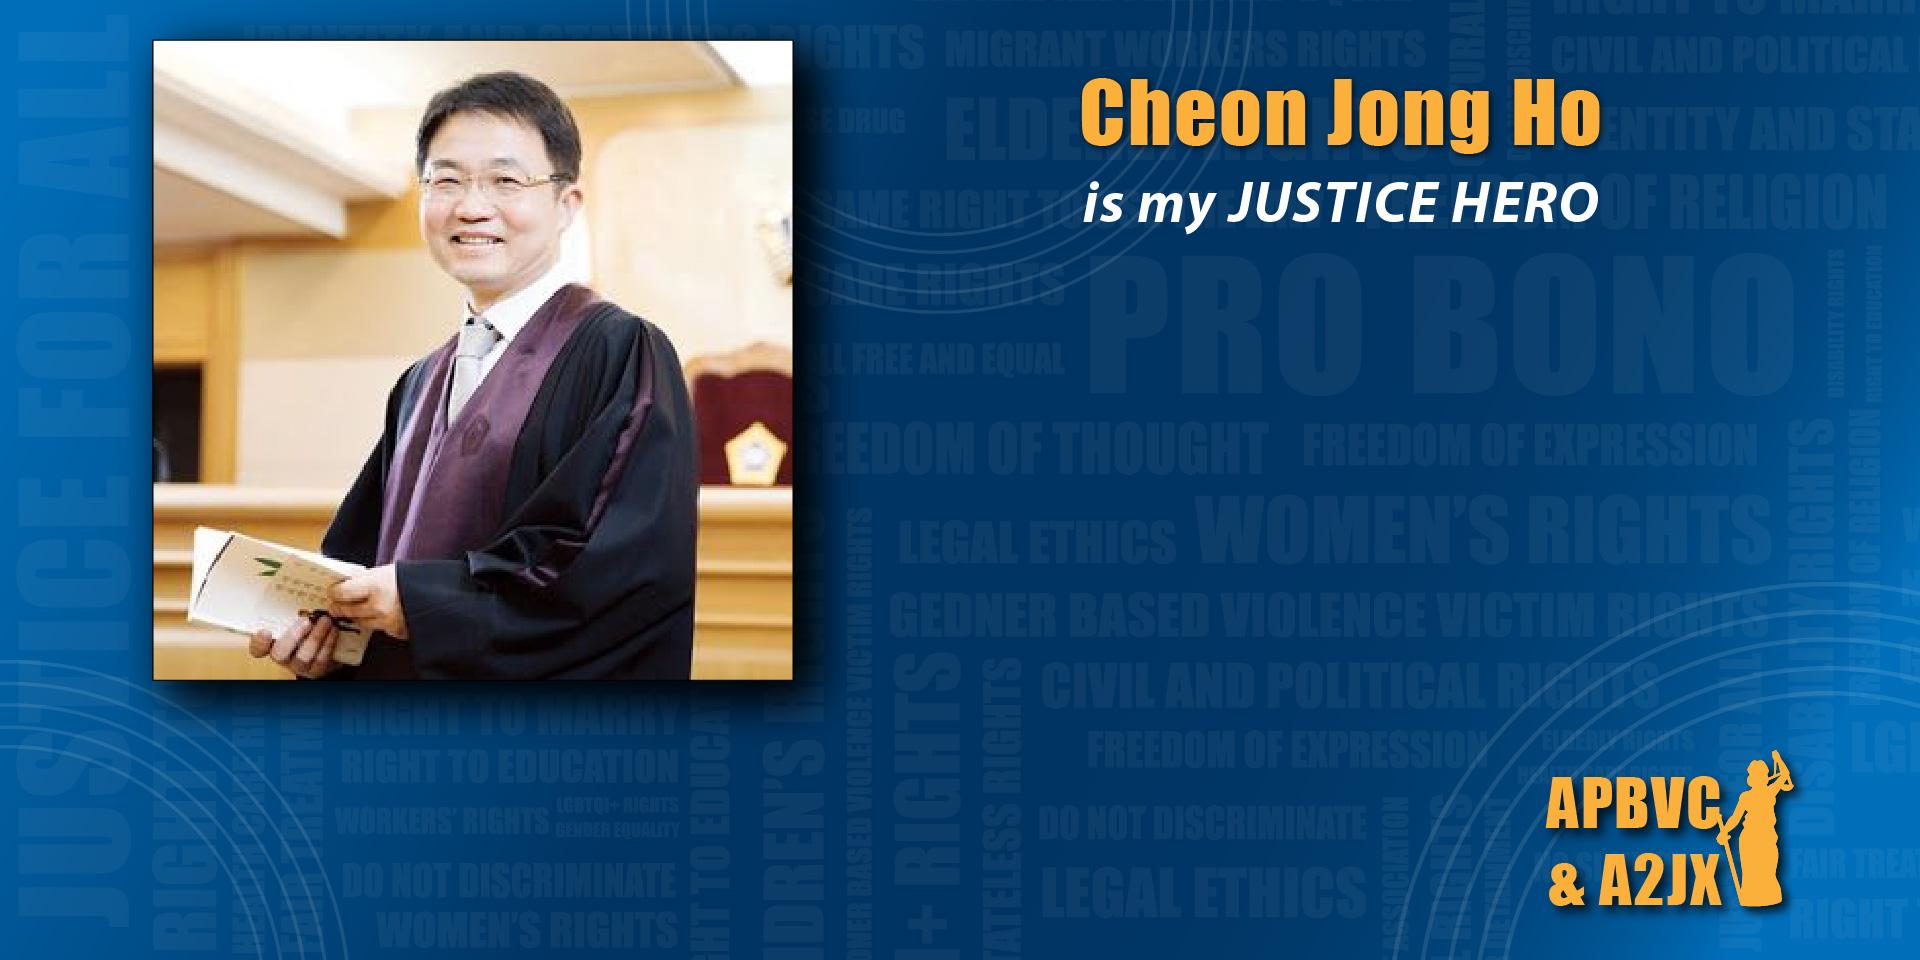 Cheon Jong Ho